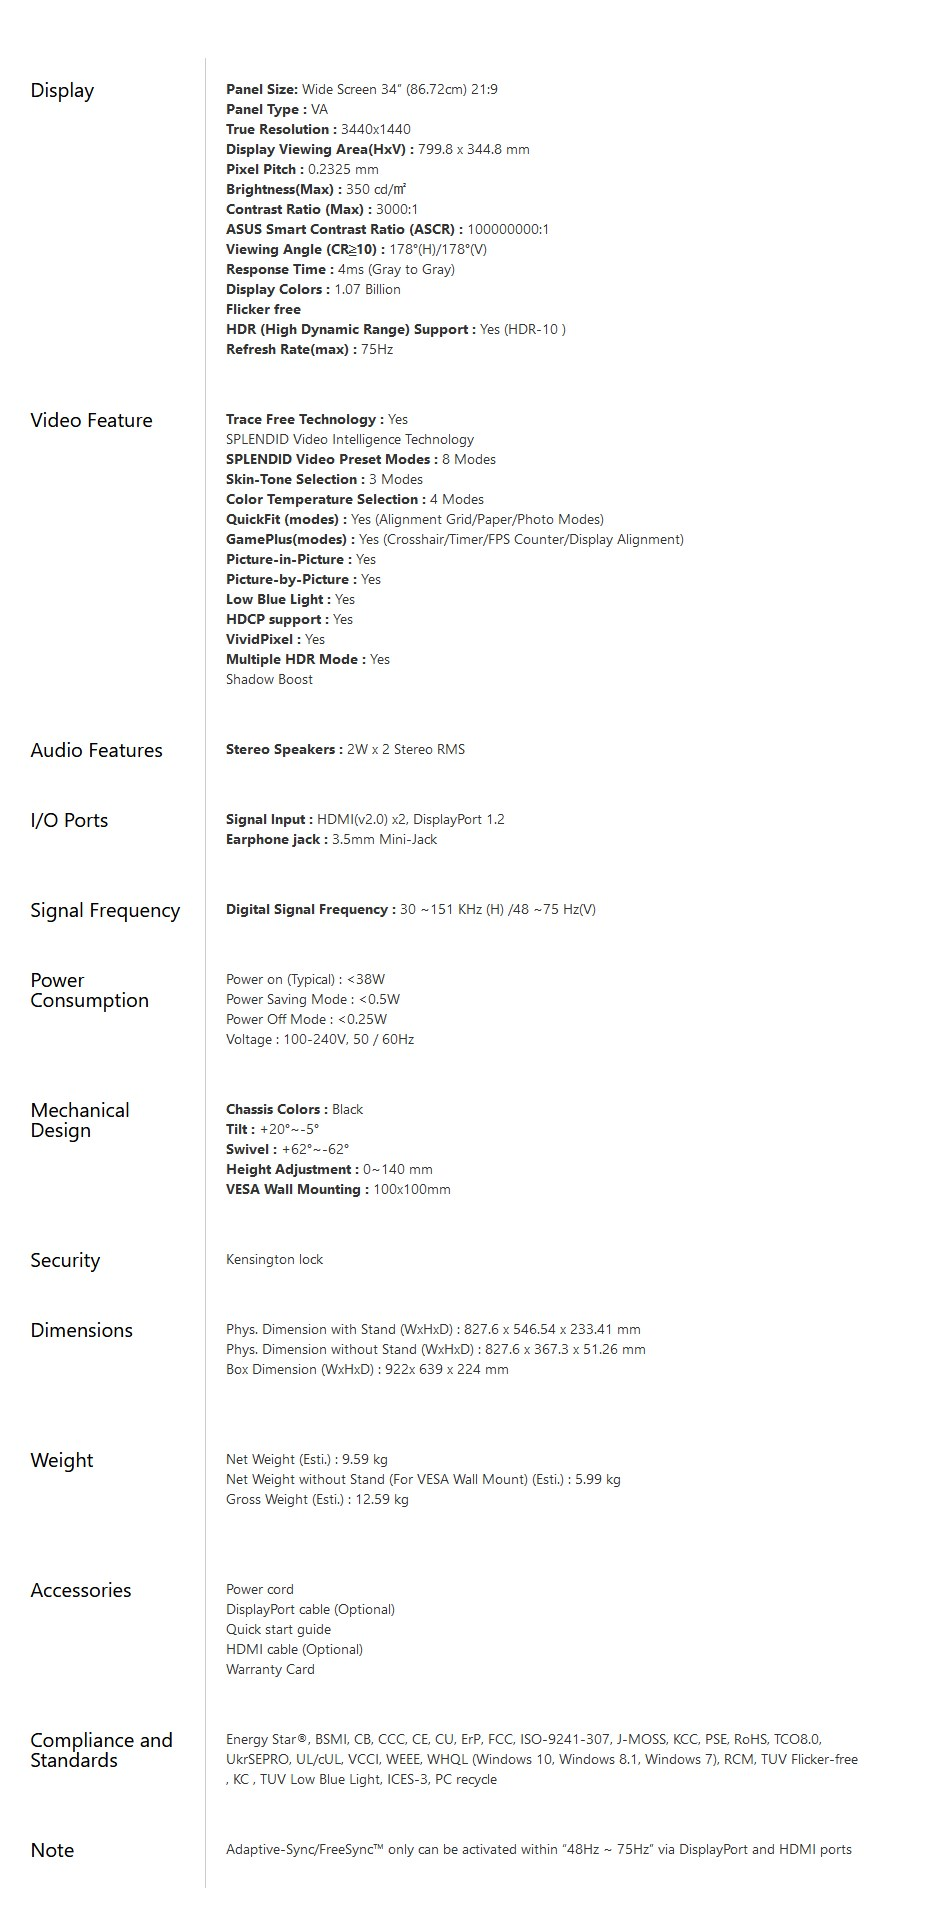 asus-vp348qgl-34-75hz-ultrawide-qhd-hdr-freesync-gaming-monitor-ac34964-9.jpg